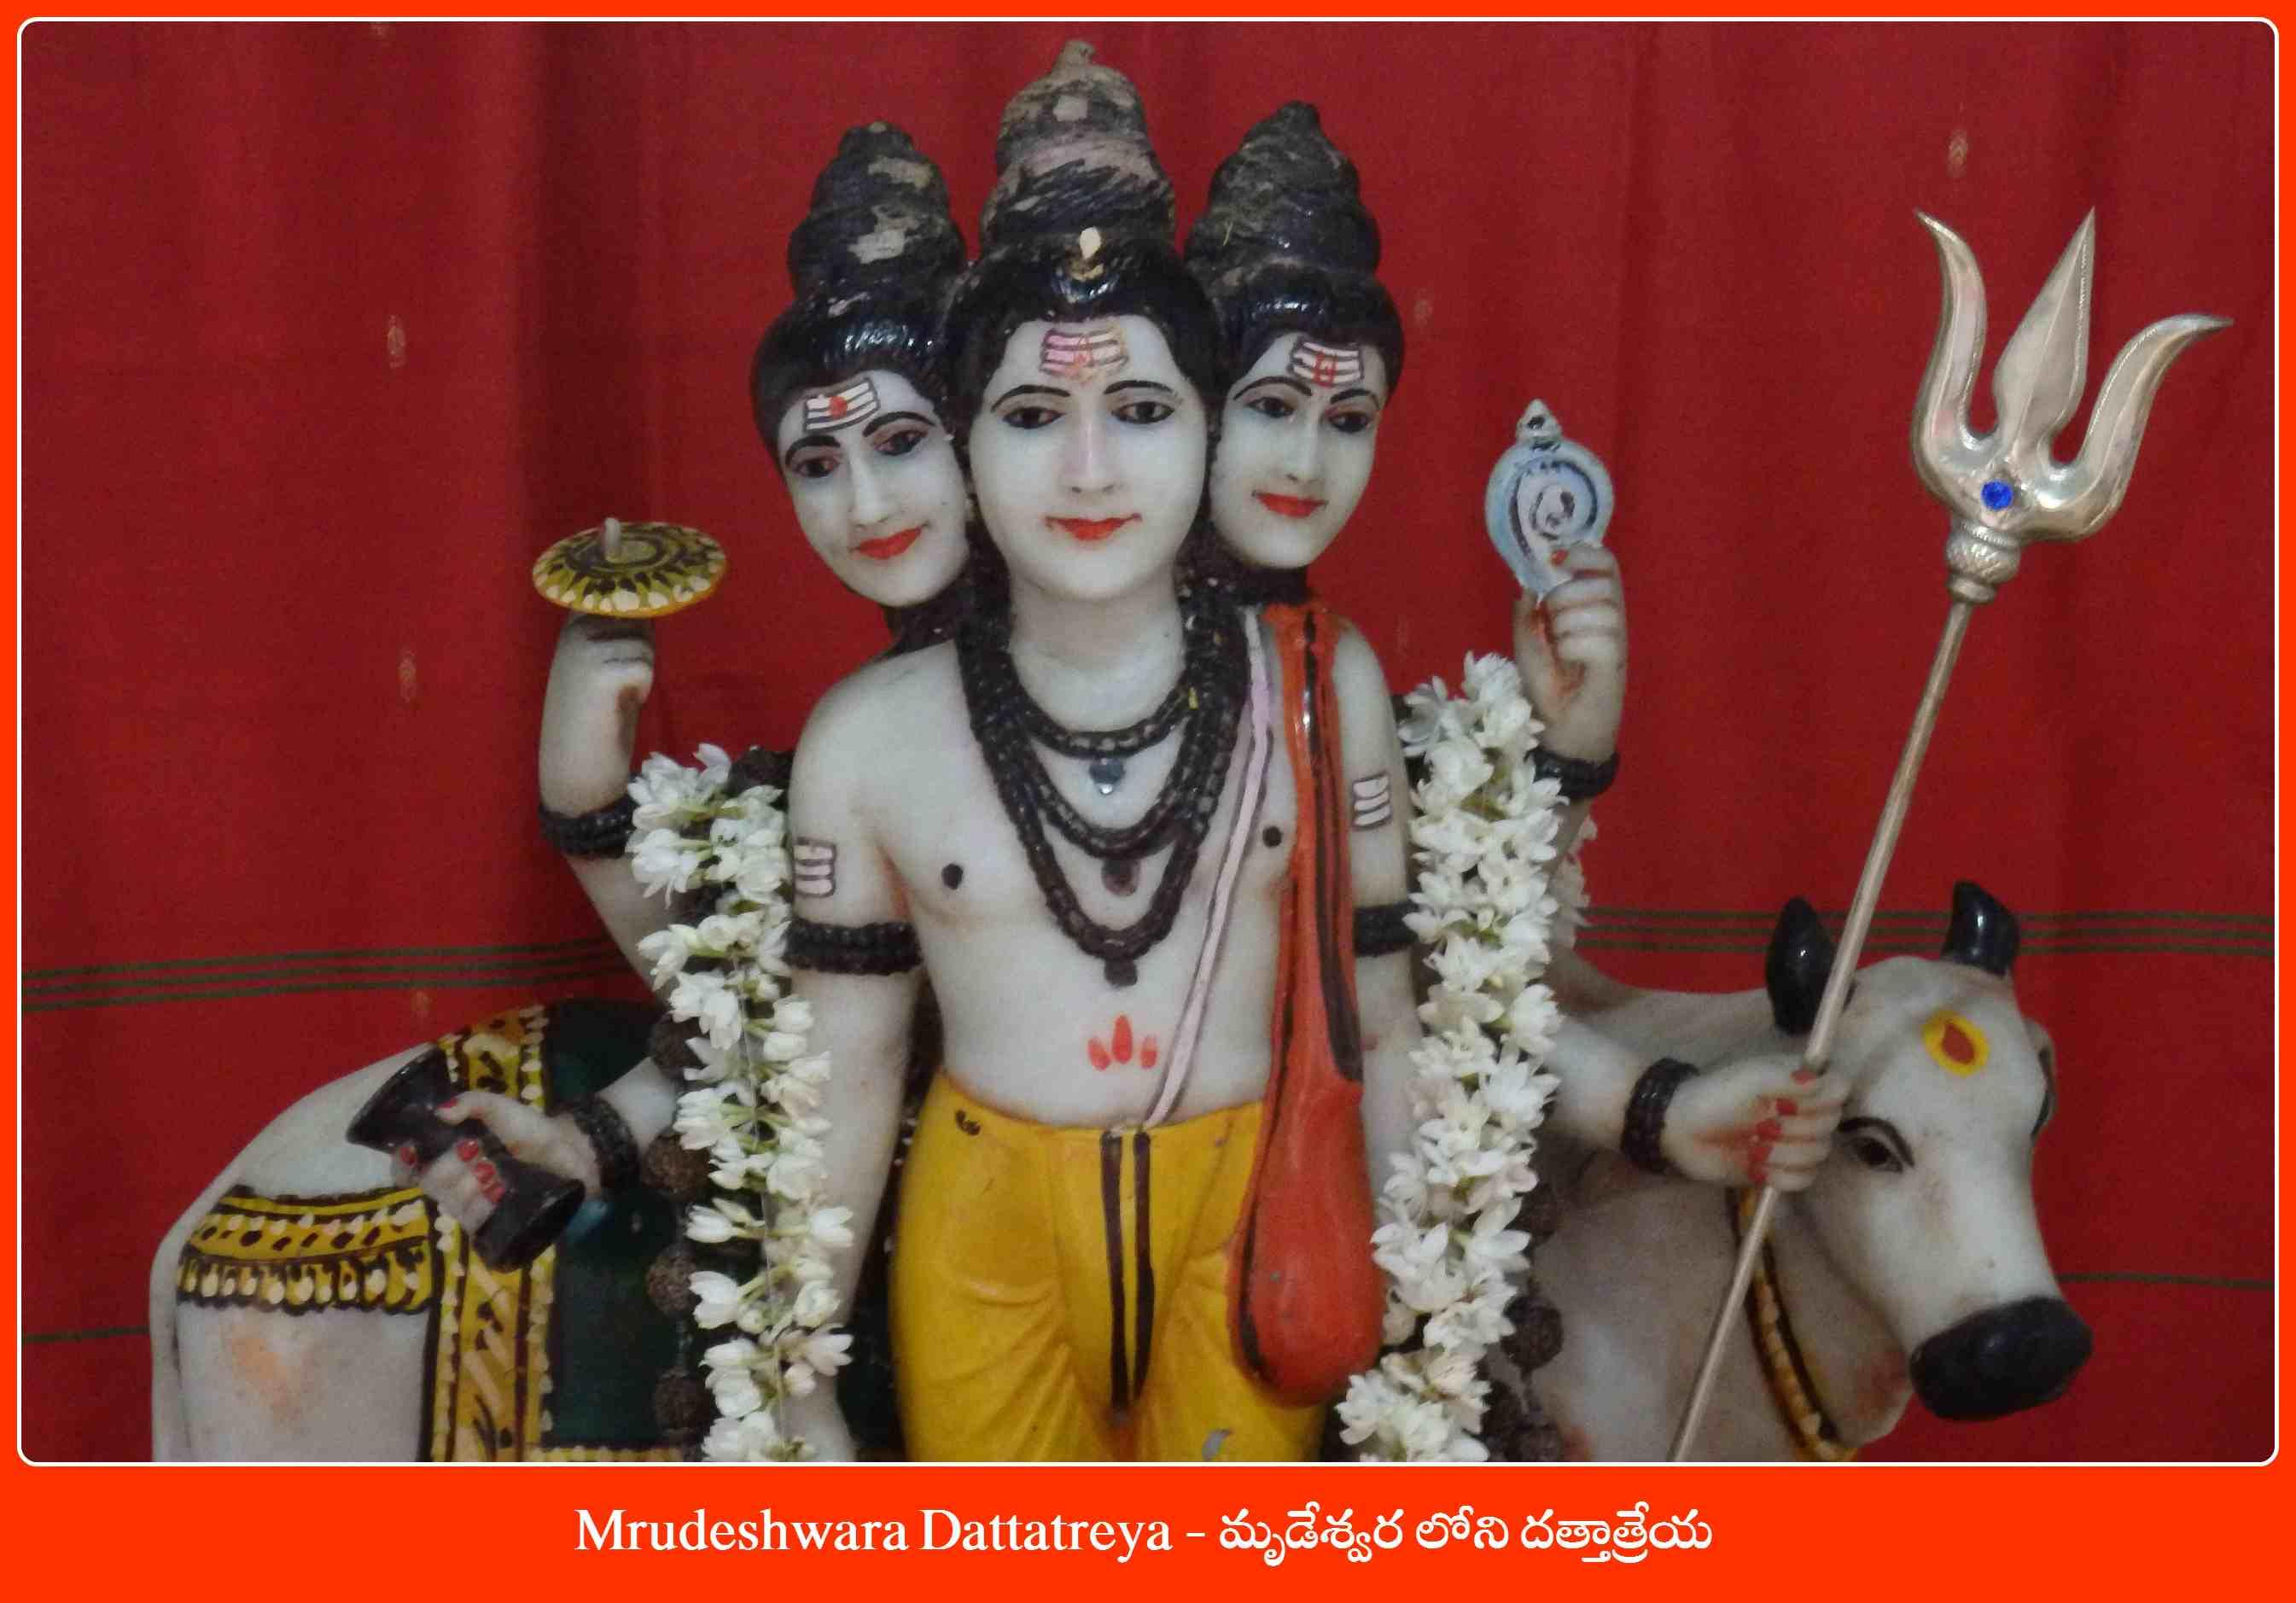 Mrudeshwara Dattatreya